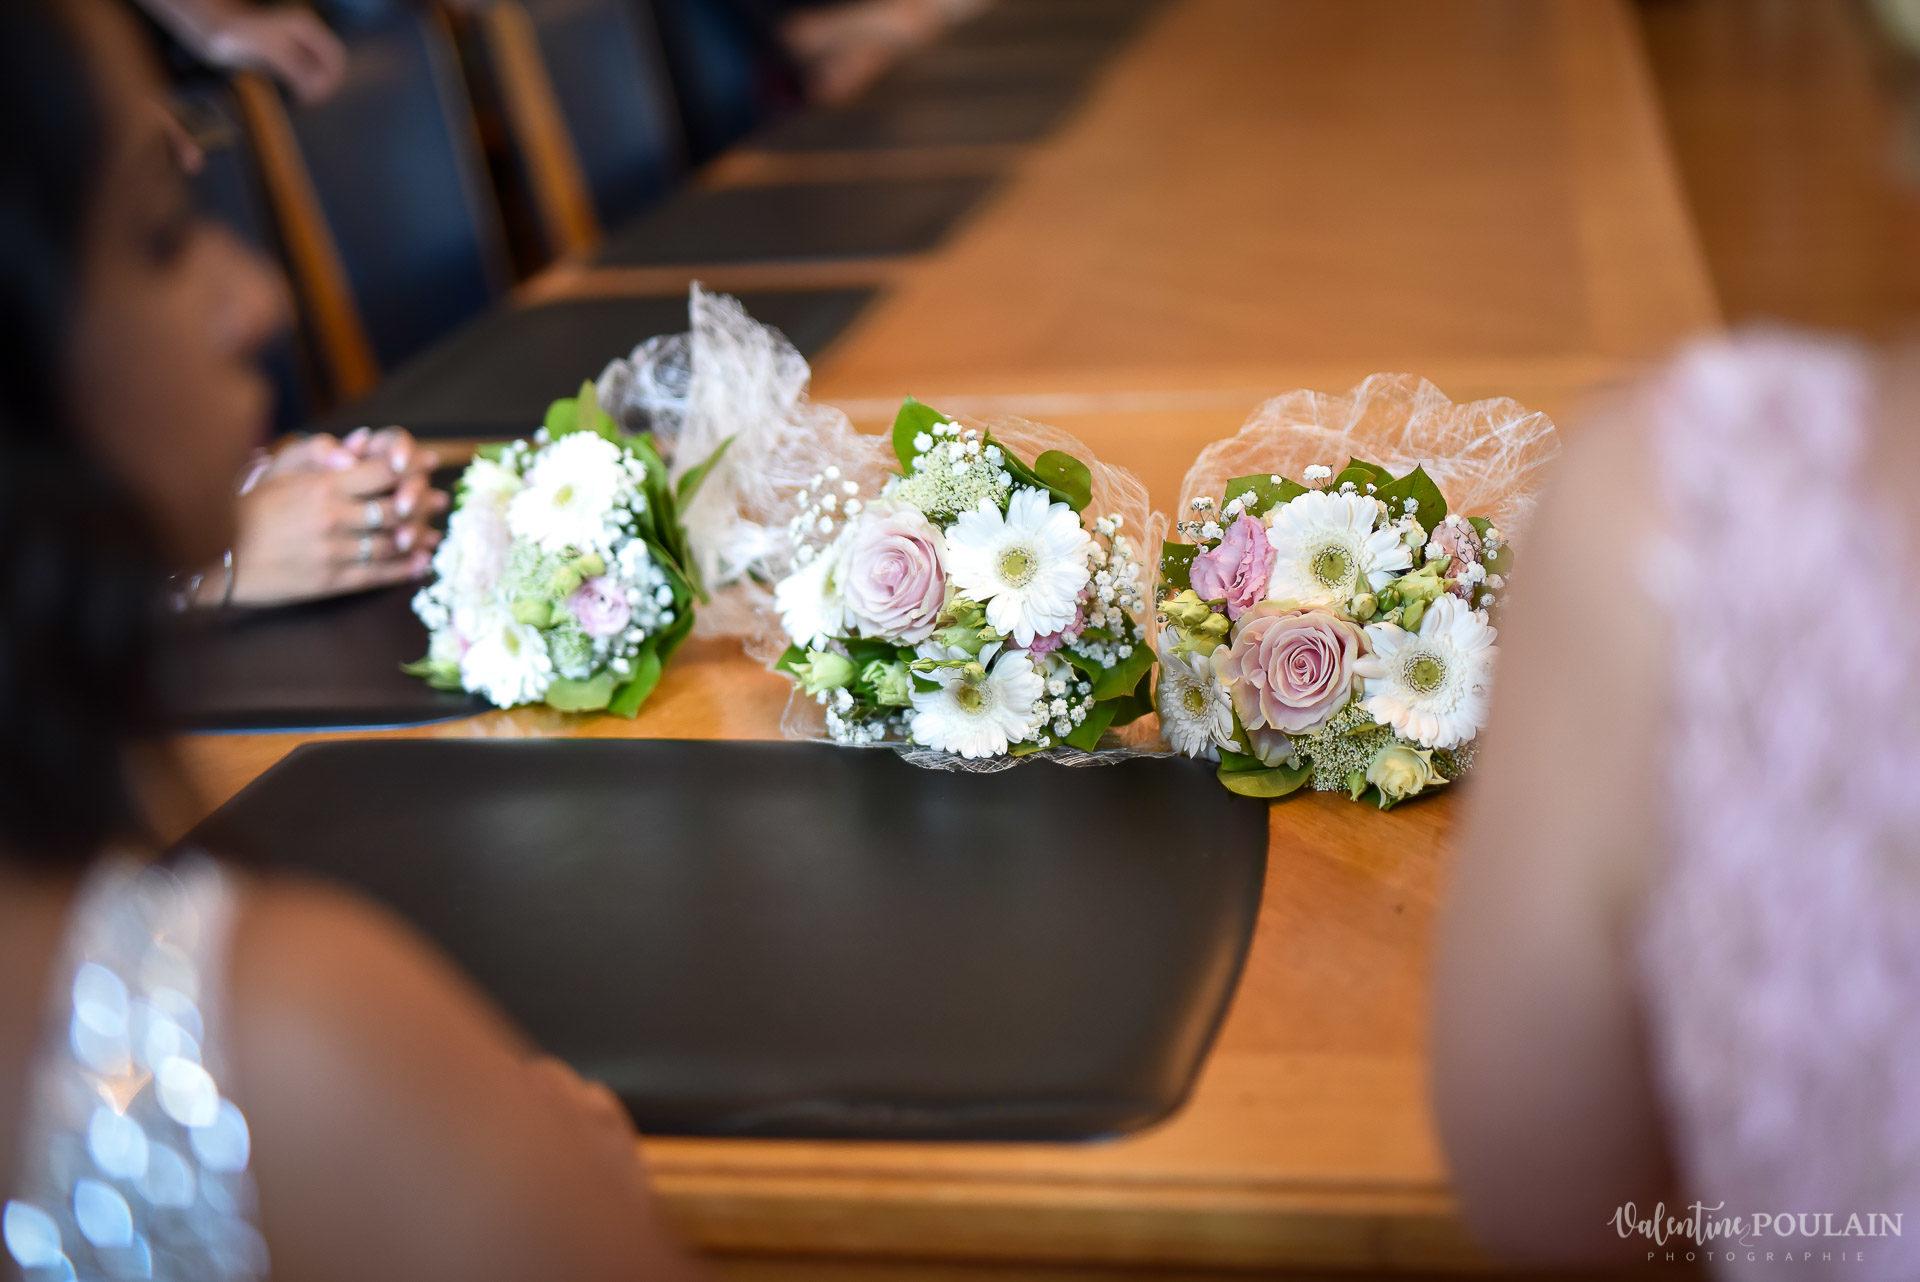 Mariage cool ferme weyerbach - Valentine Poulain bouquets